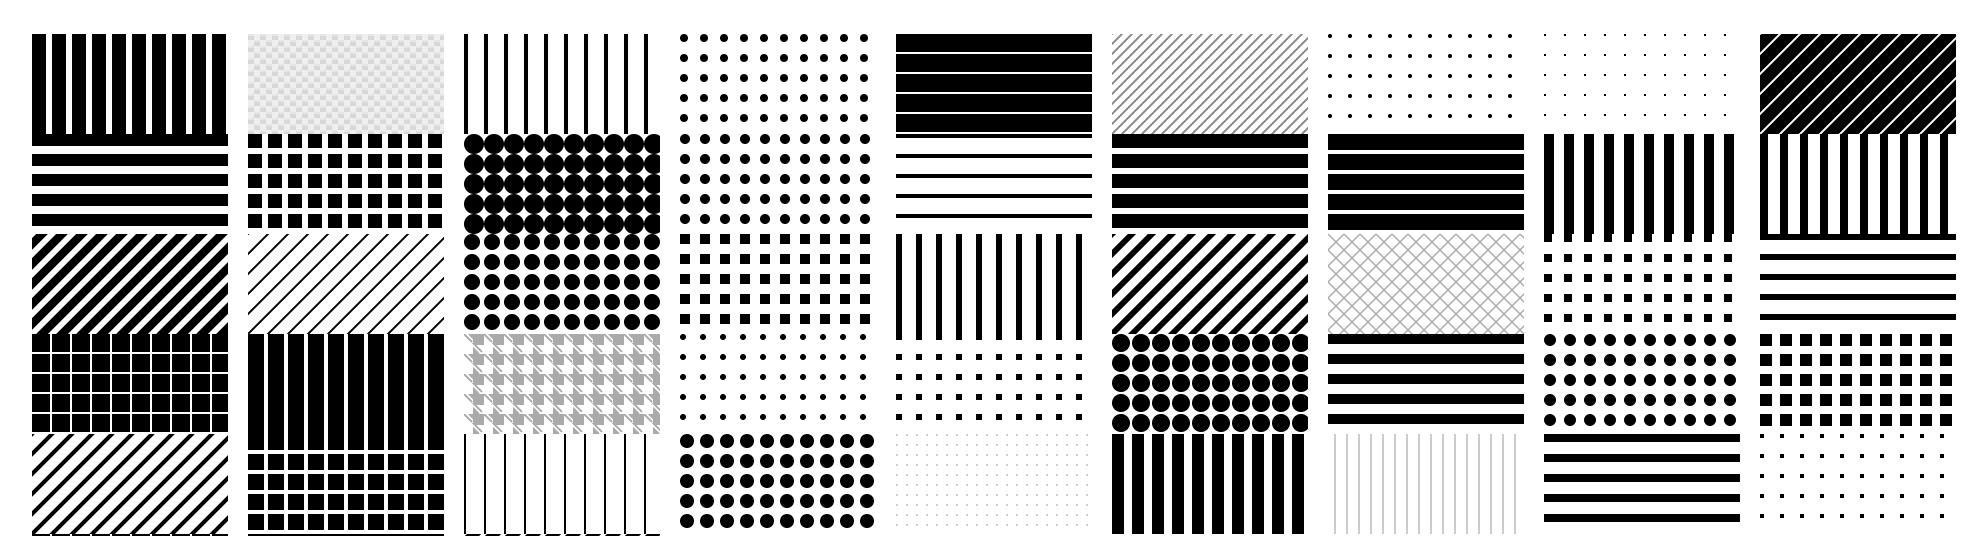 Iros Patterns